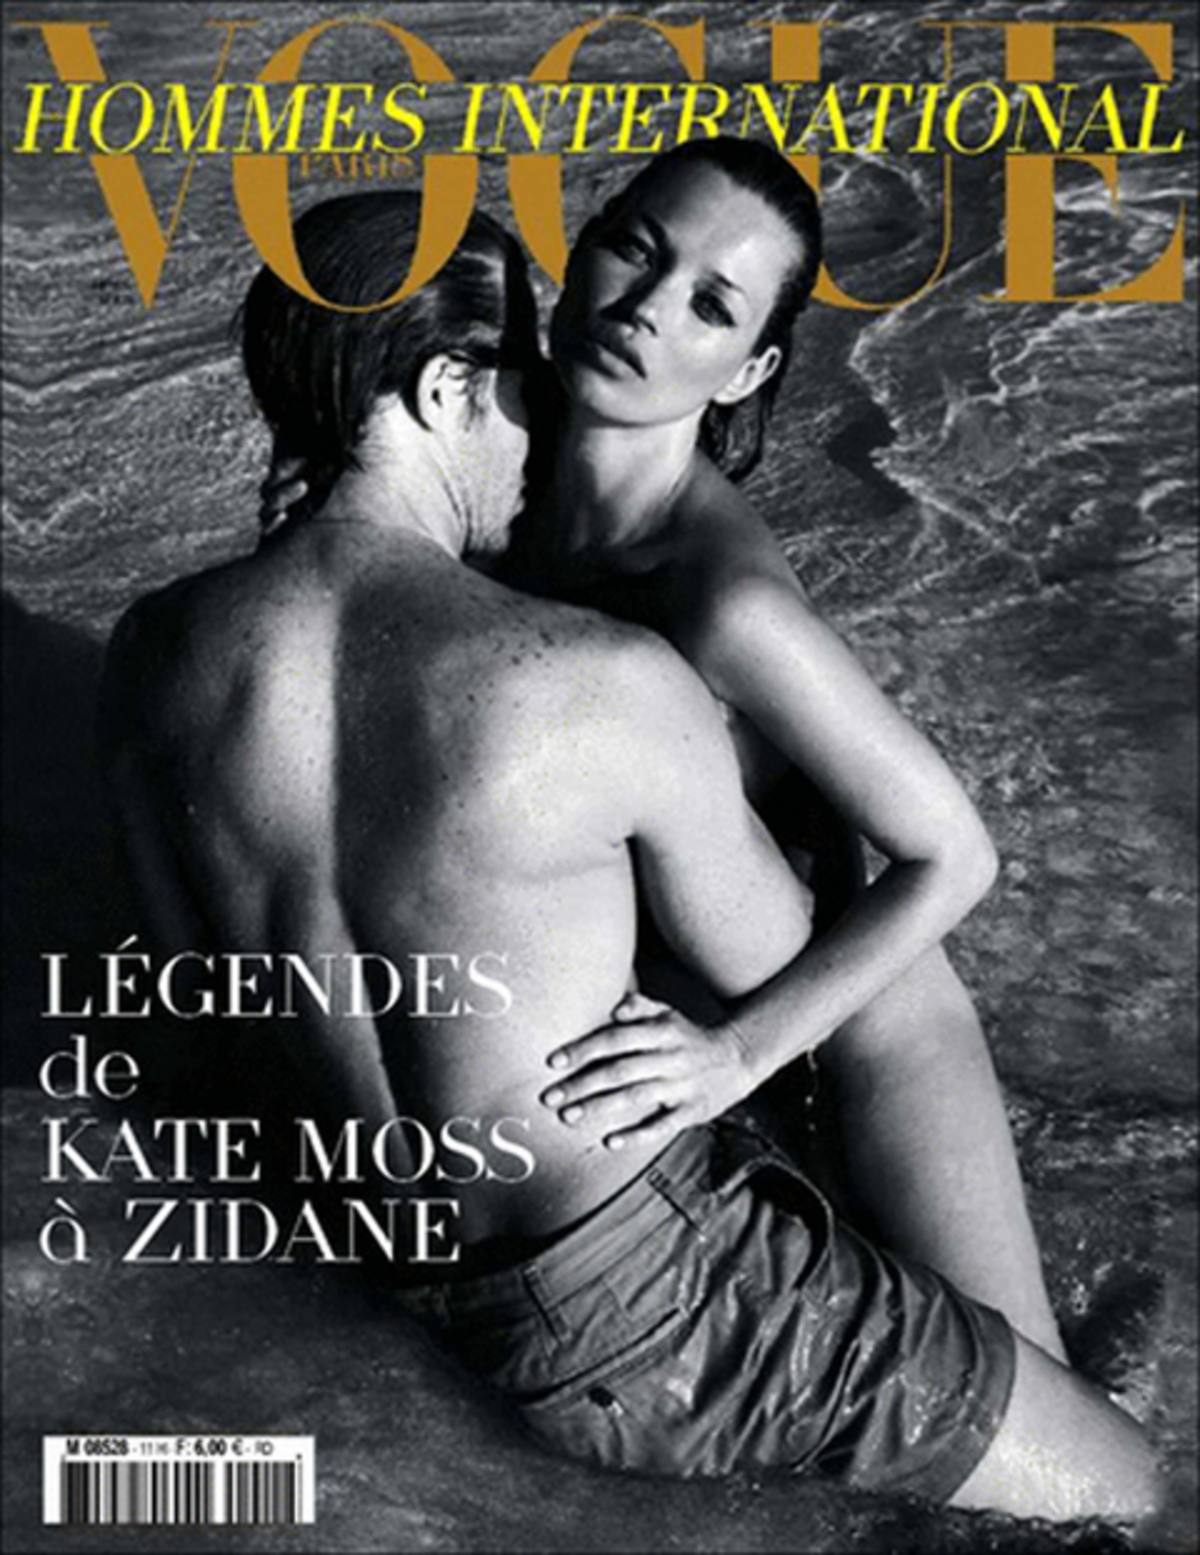 H γυμνή φωτογράφηση της Kate Moss | Newsit.gr